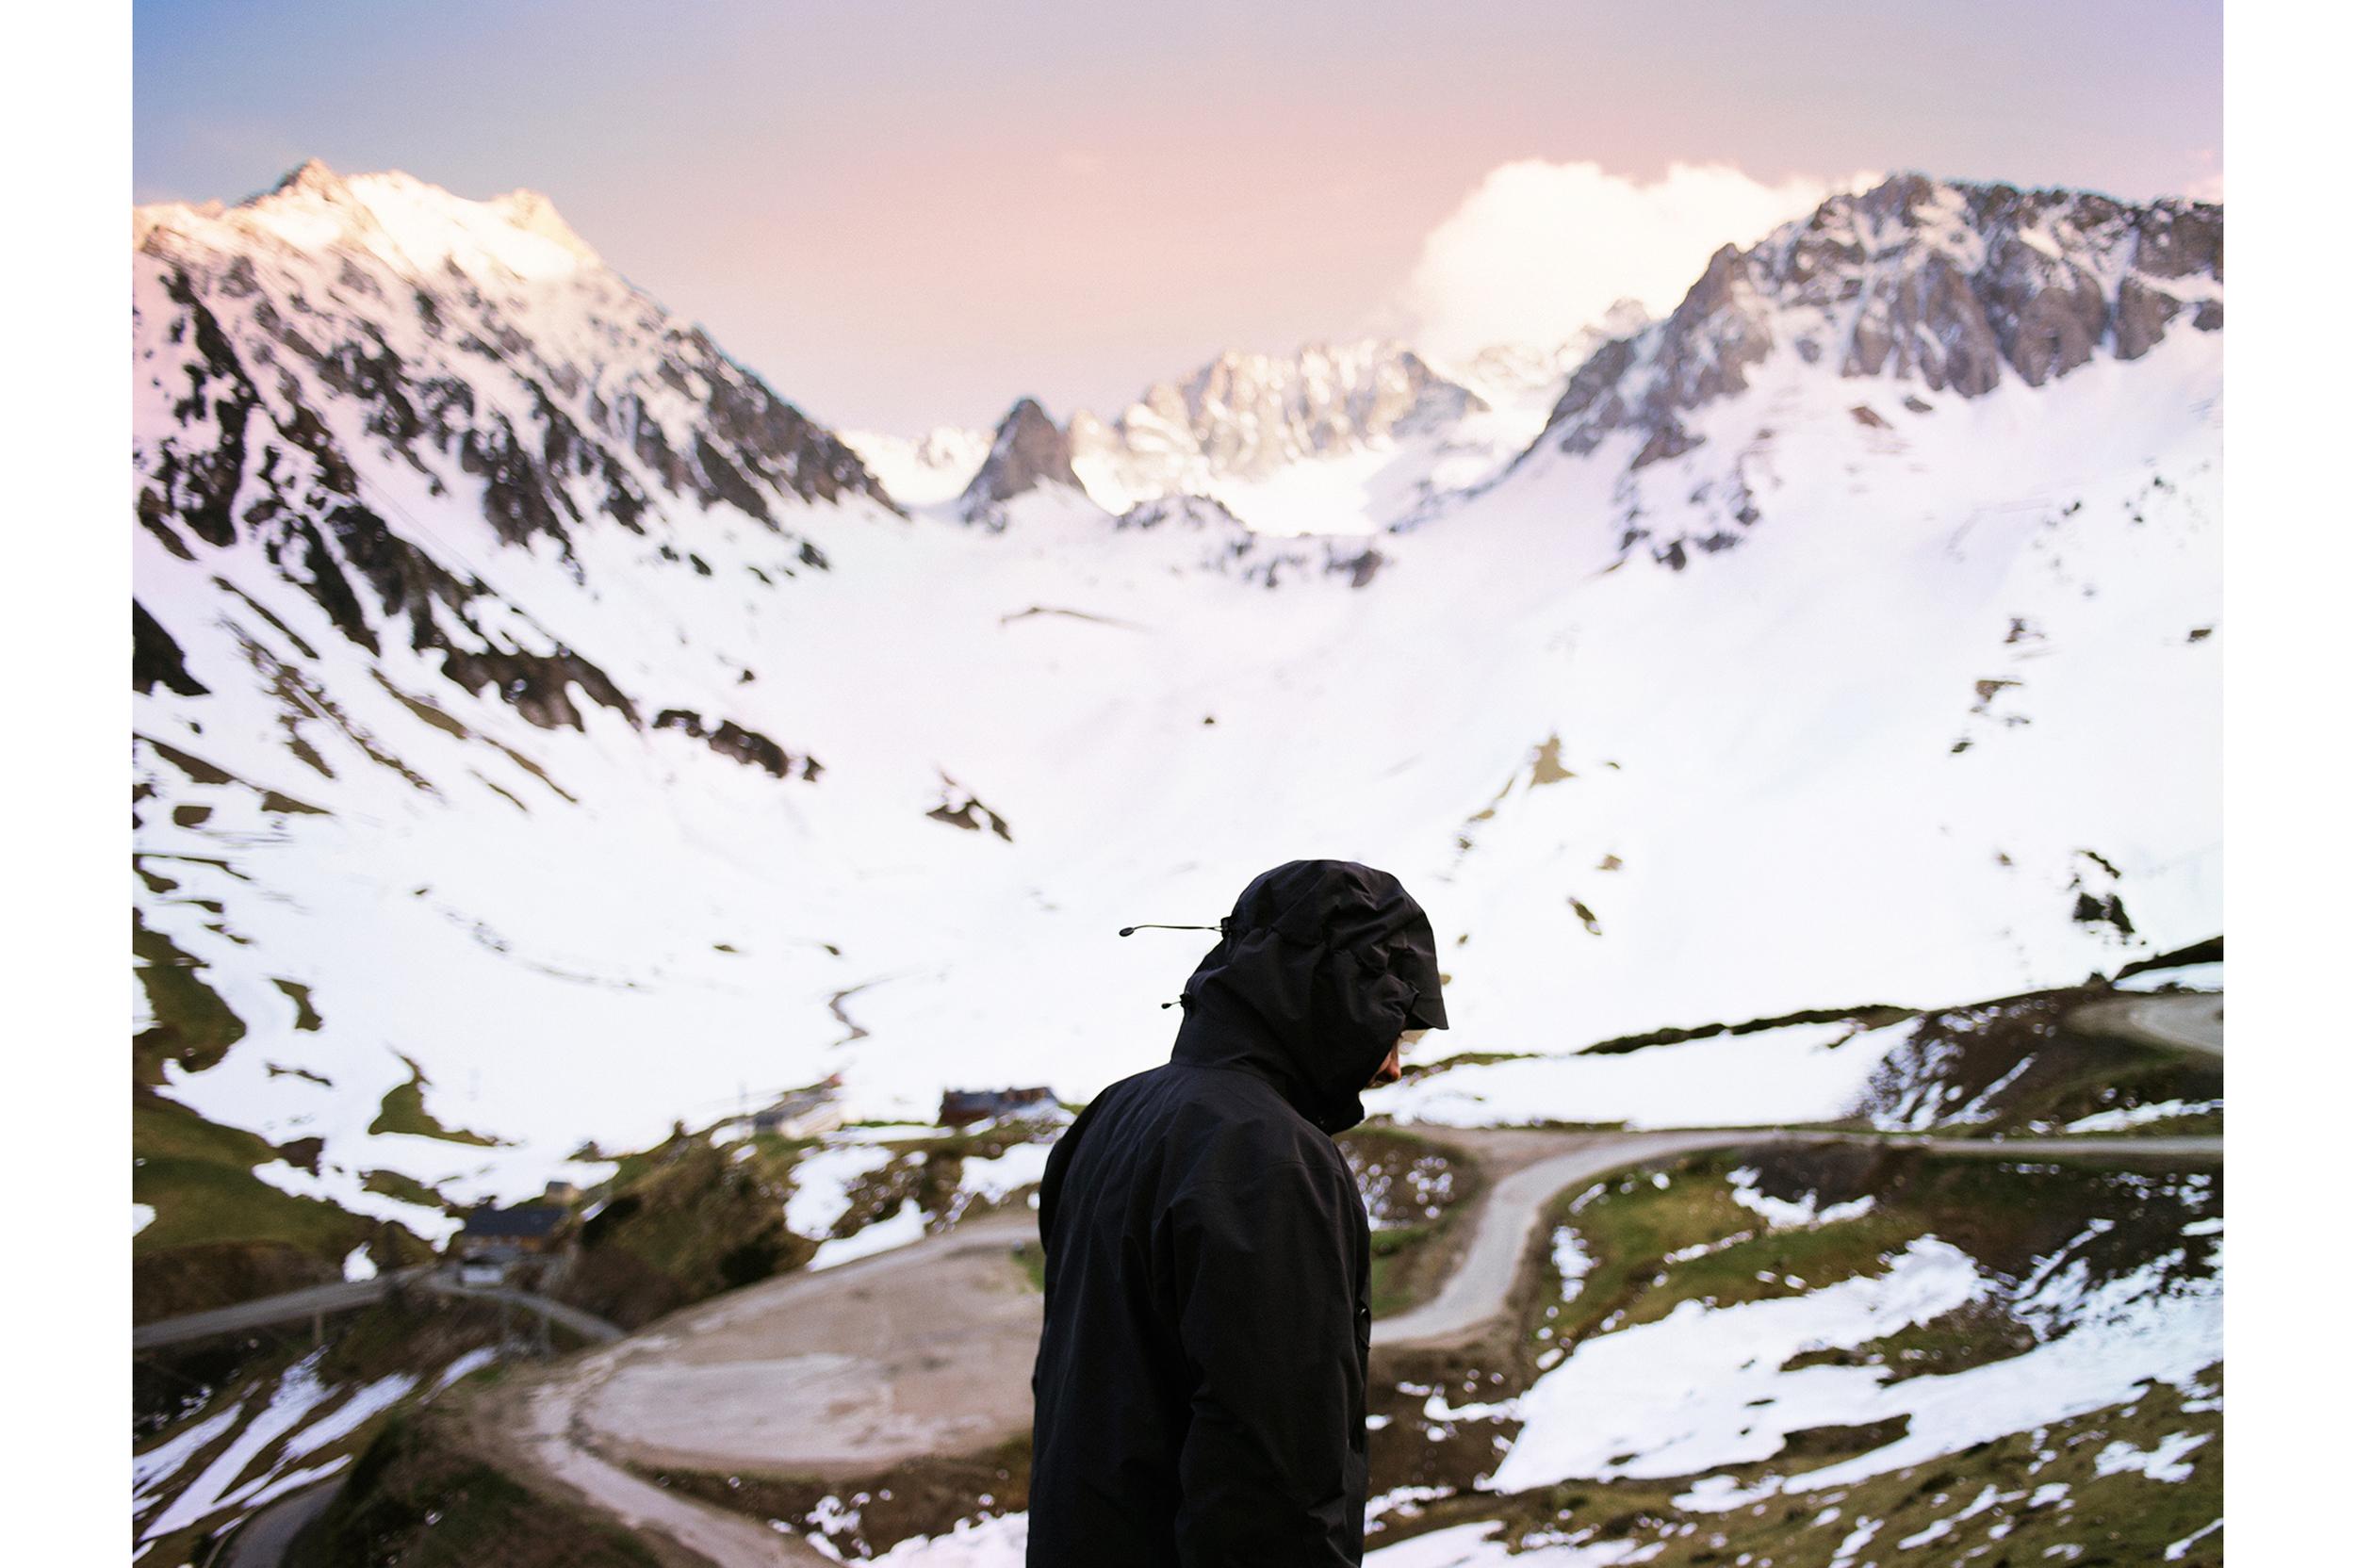 Gianrico, Pic du Midi, 2014